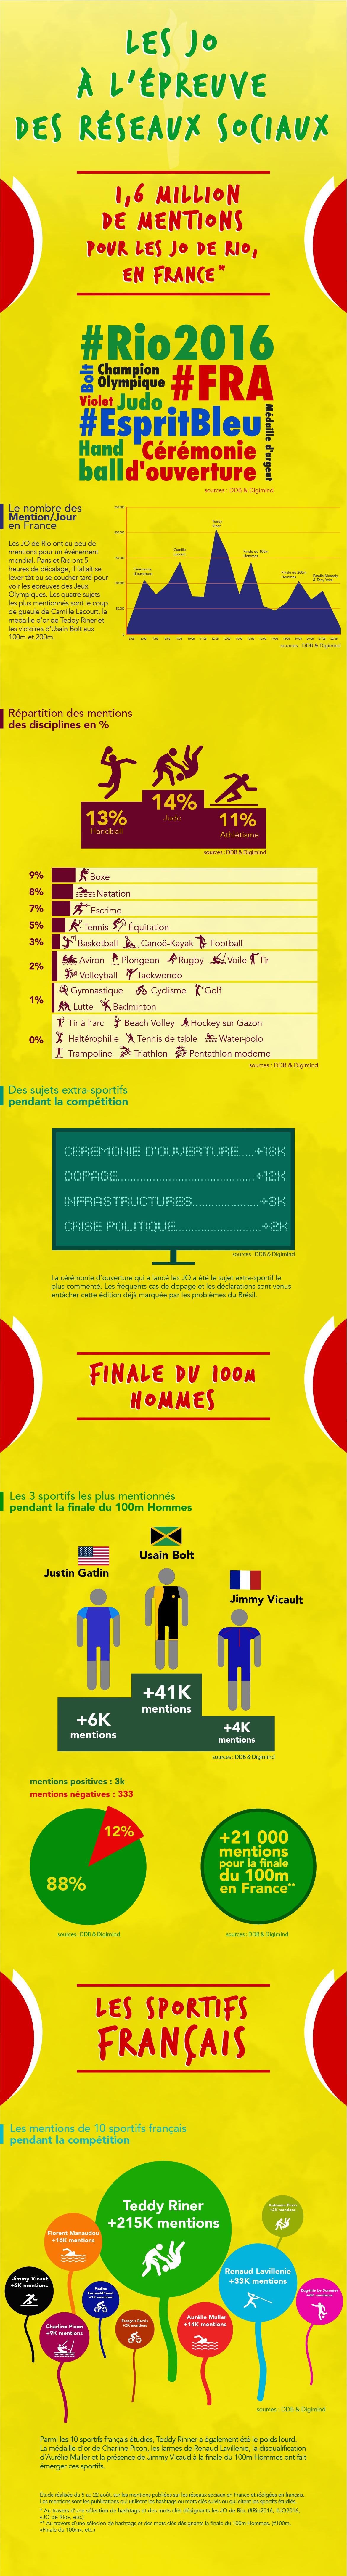 infographie-jo-01